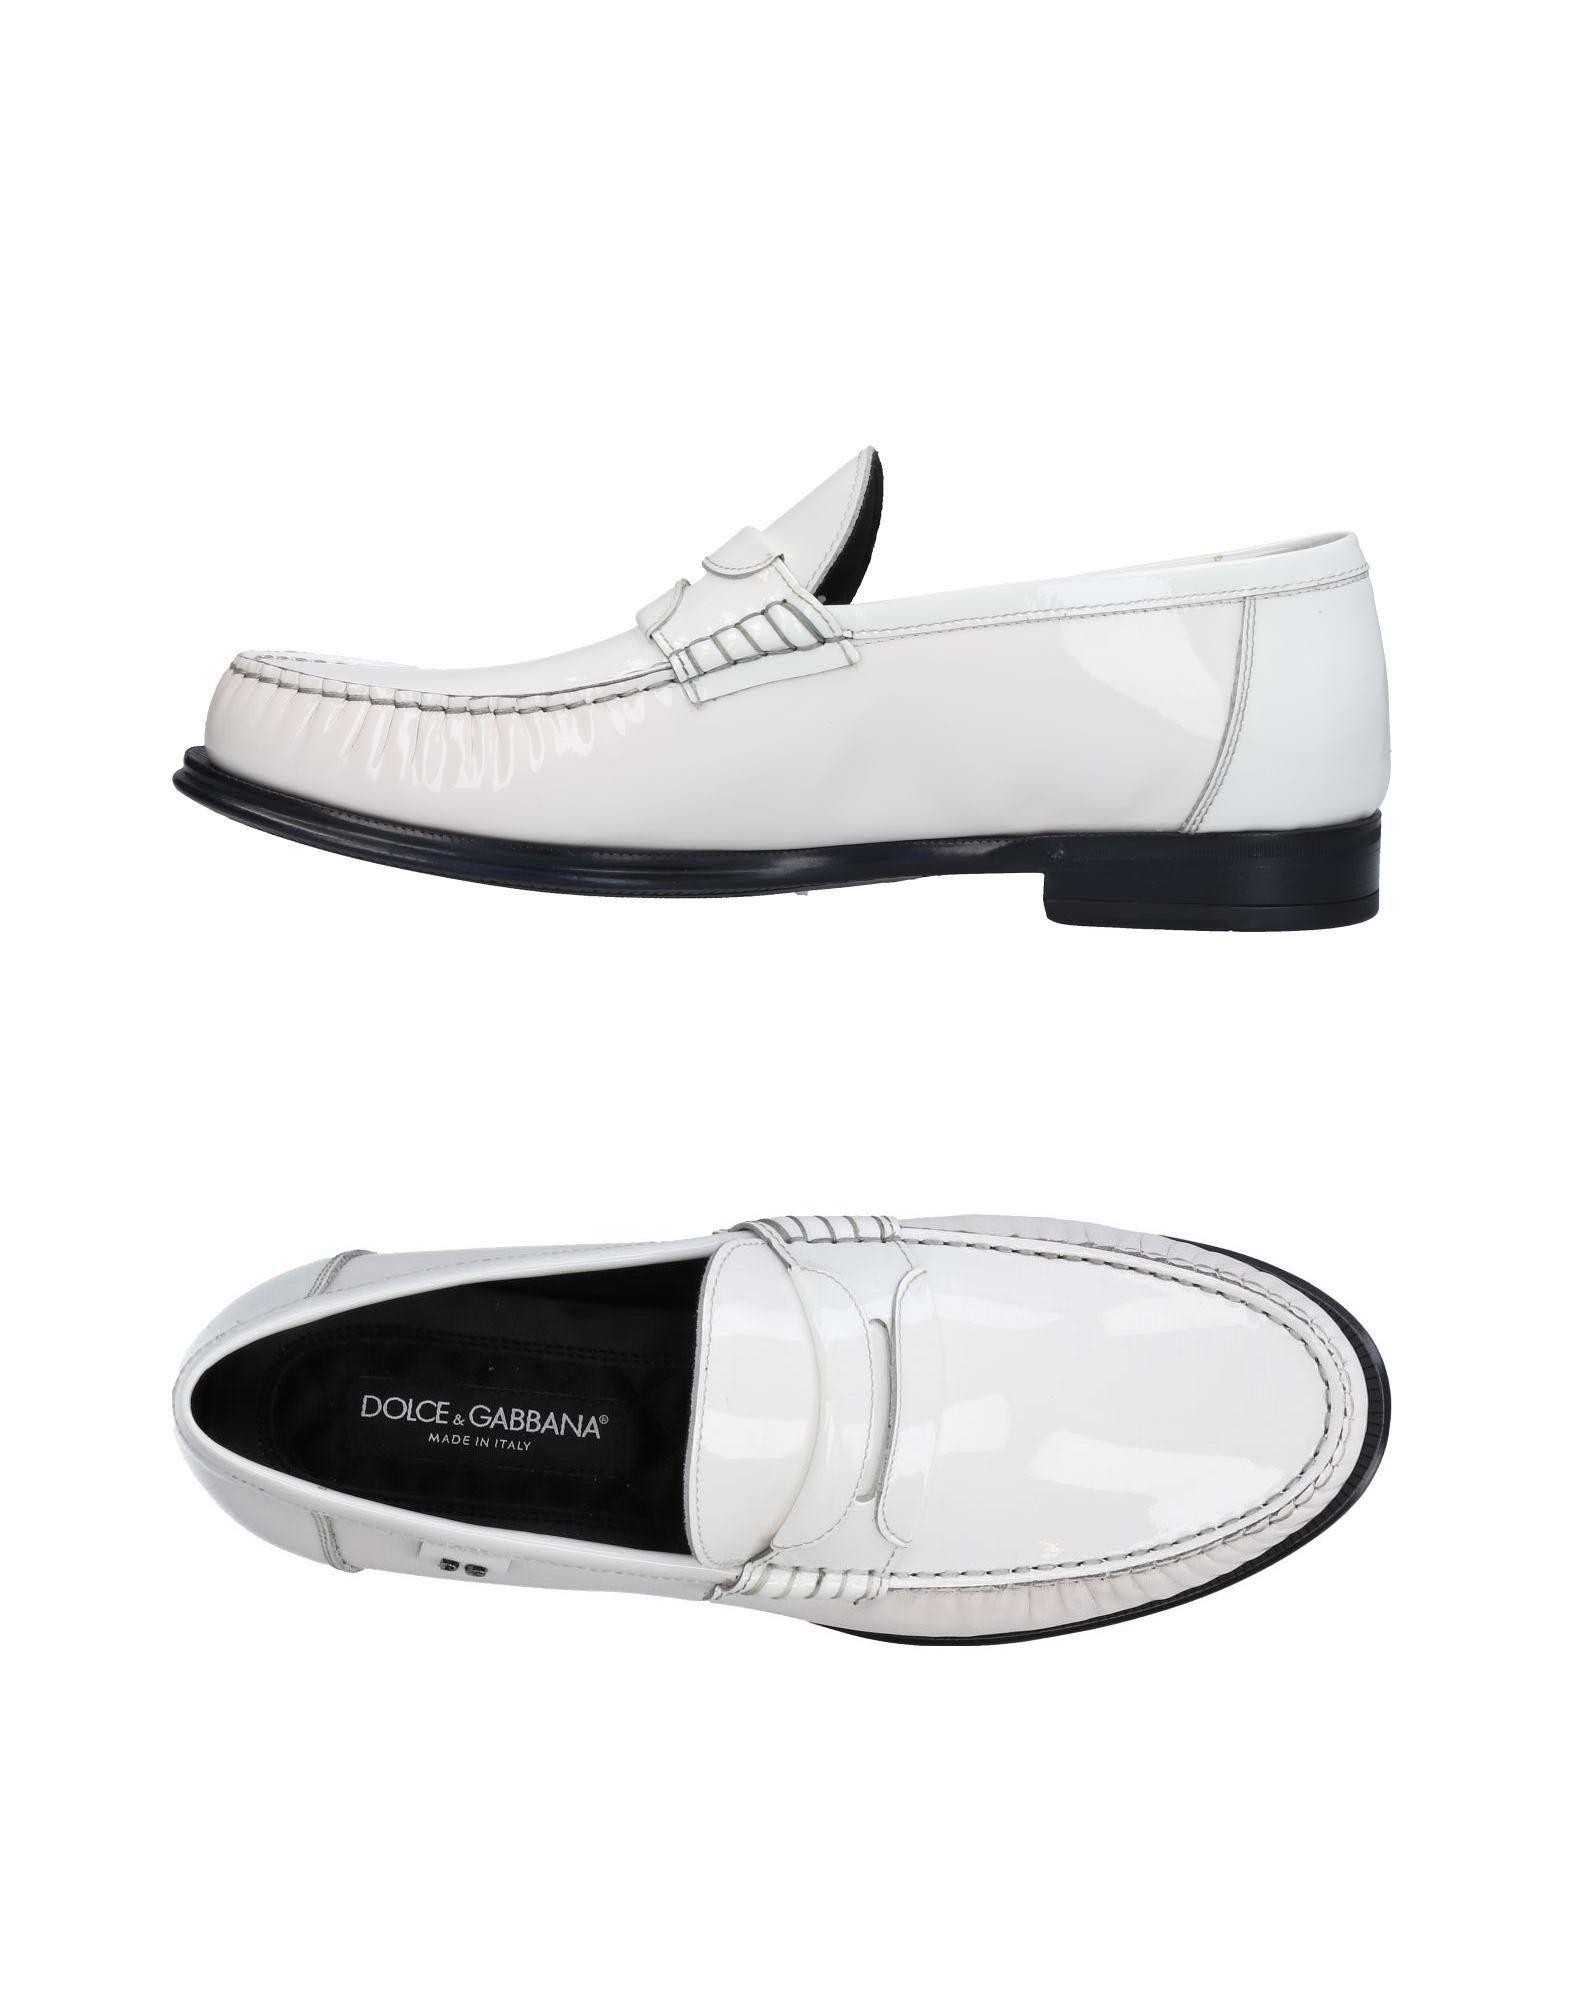 Dolce & Gabbana Loafers - Men Dolce on & Gabbana Loafers online on Dolce  Australia - 11421824OX 14599c